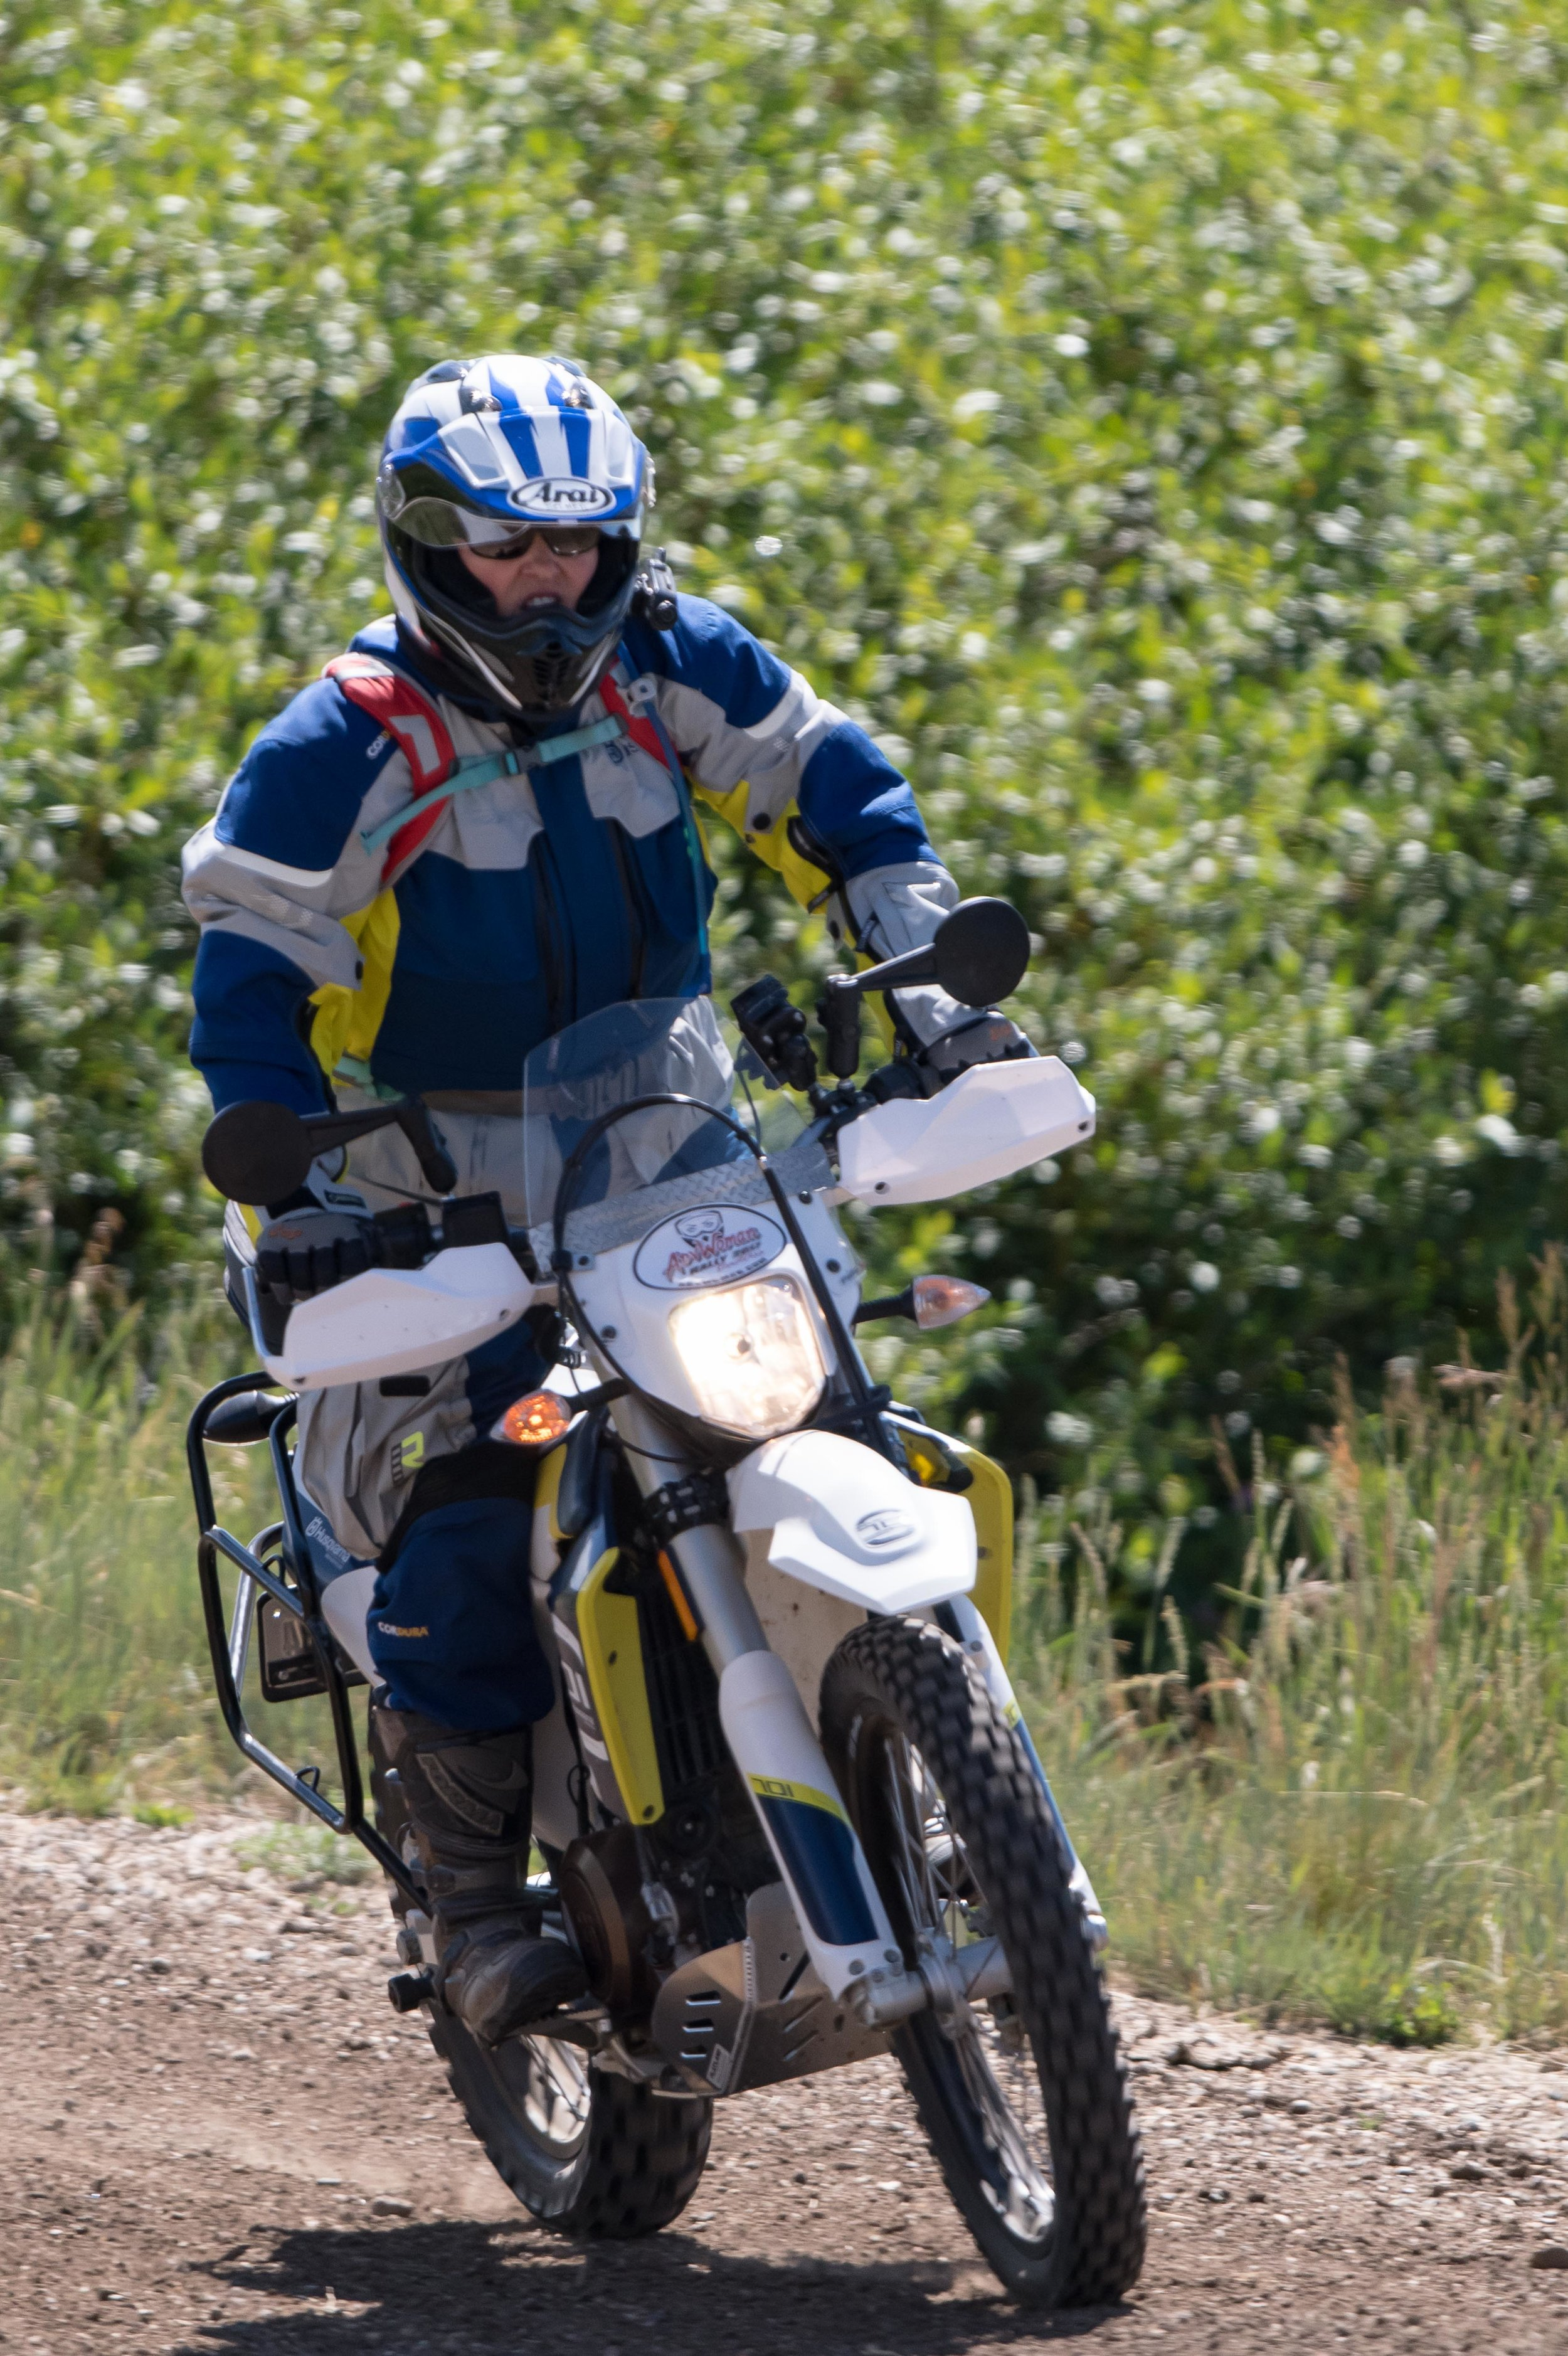 Pat-Jacques-ADV-Woman-Adventure_Rider-Radio-Motorcycle-Podcast-4.jpg